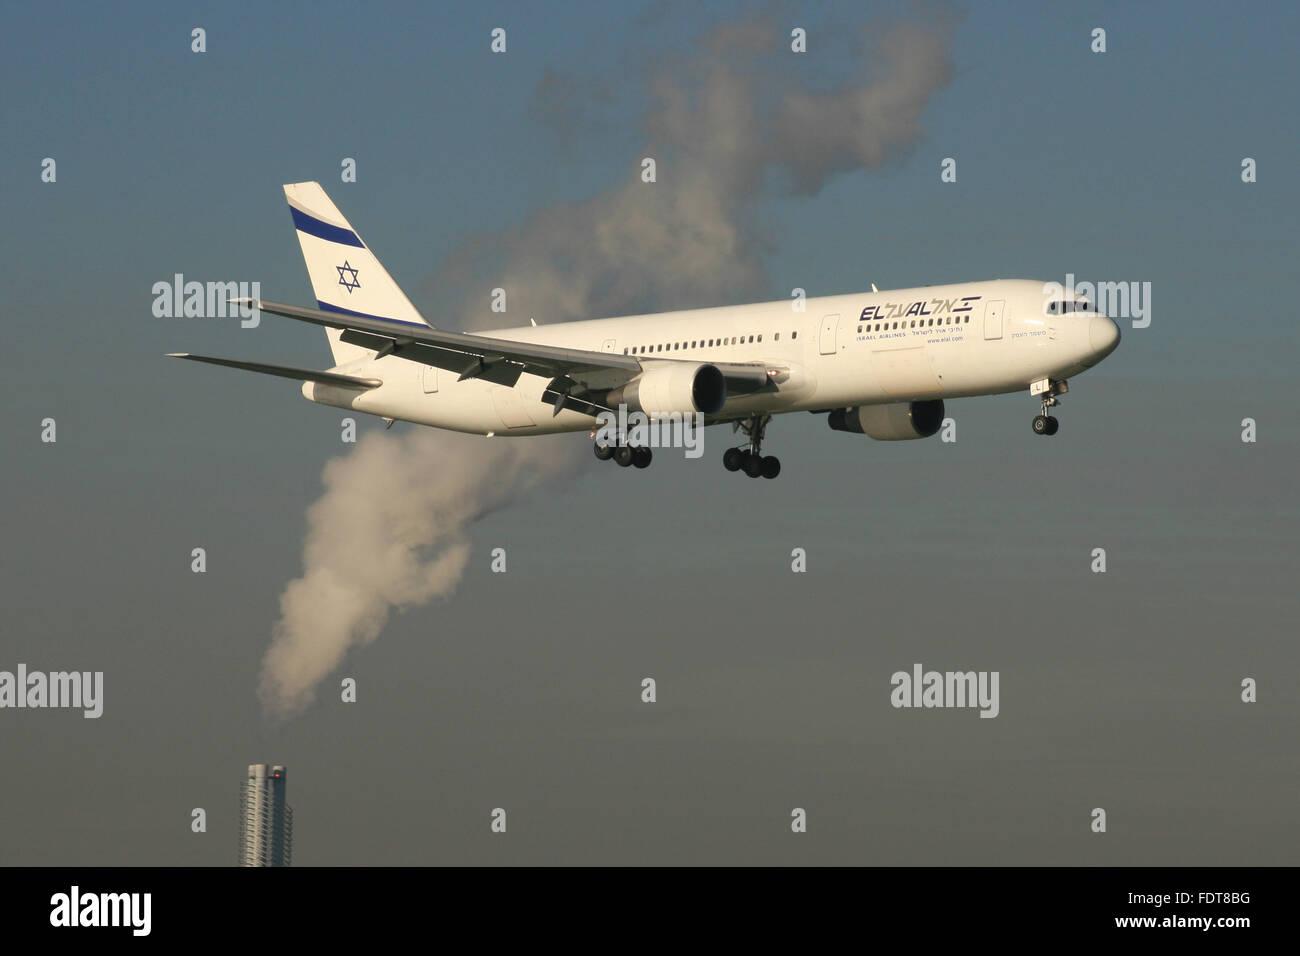 POLLUTION PLANE C02 - Stock Image